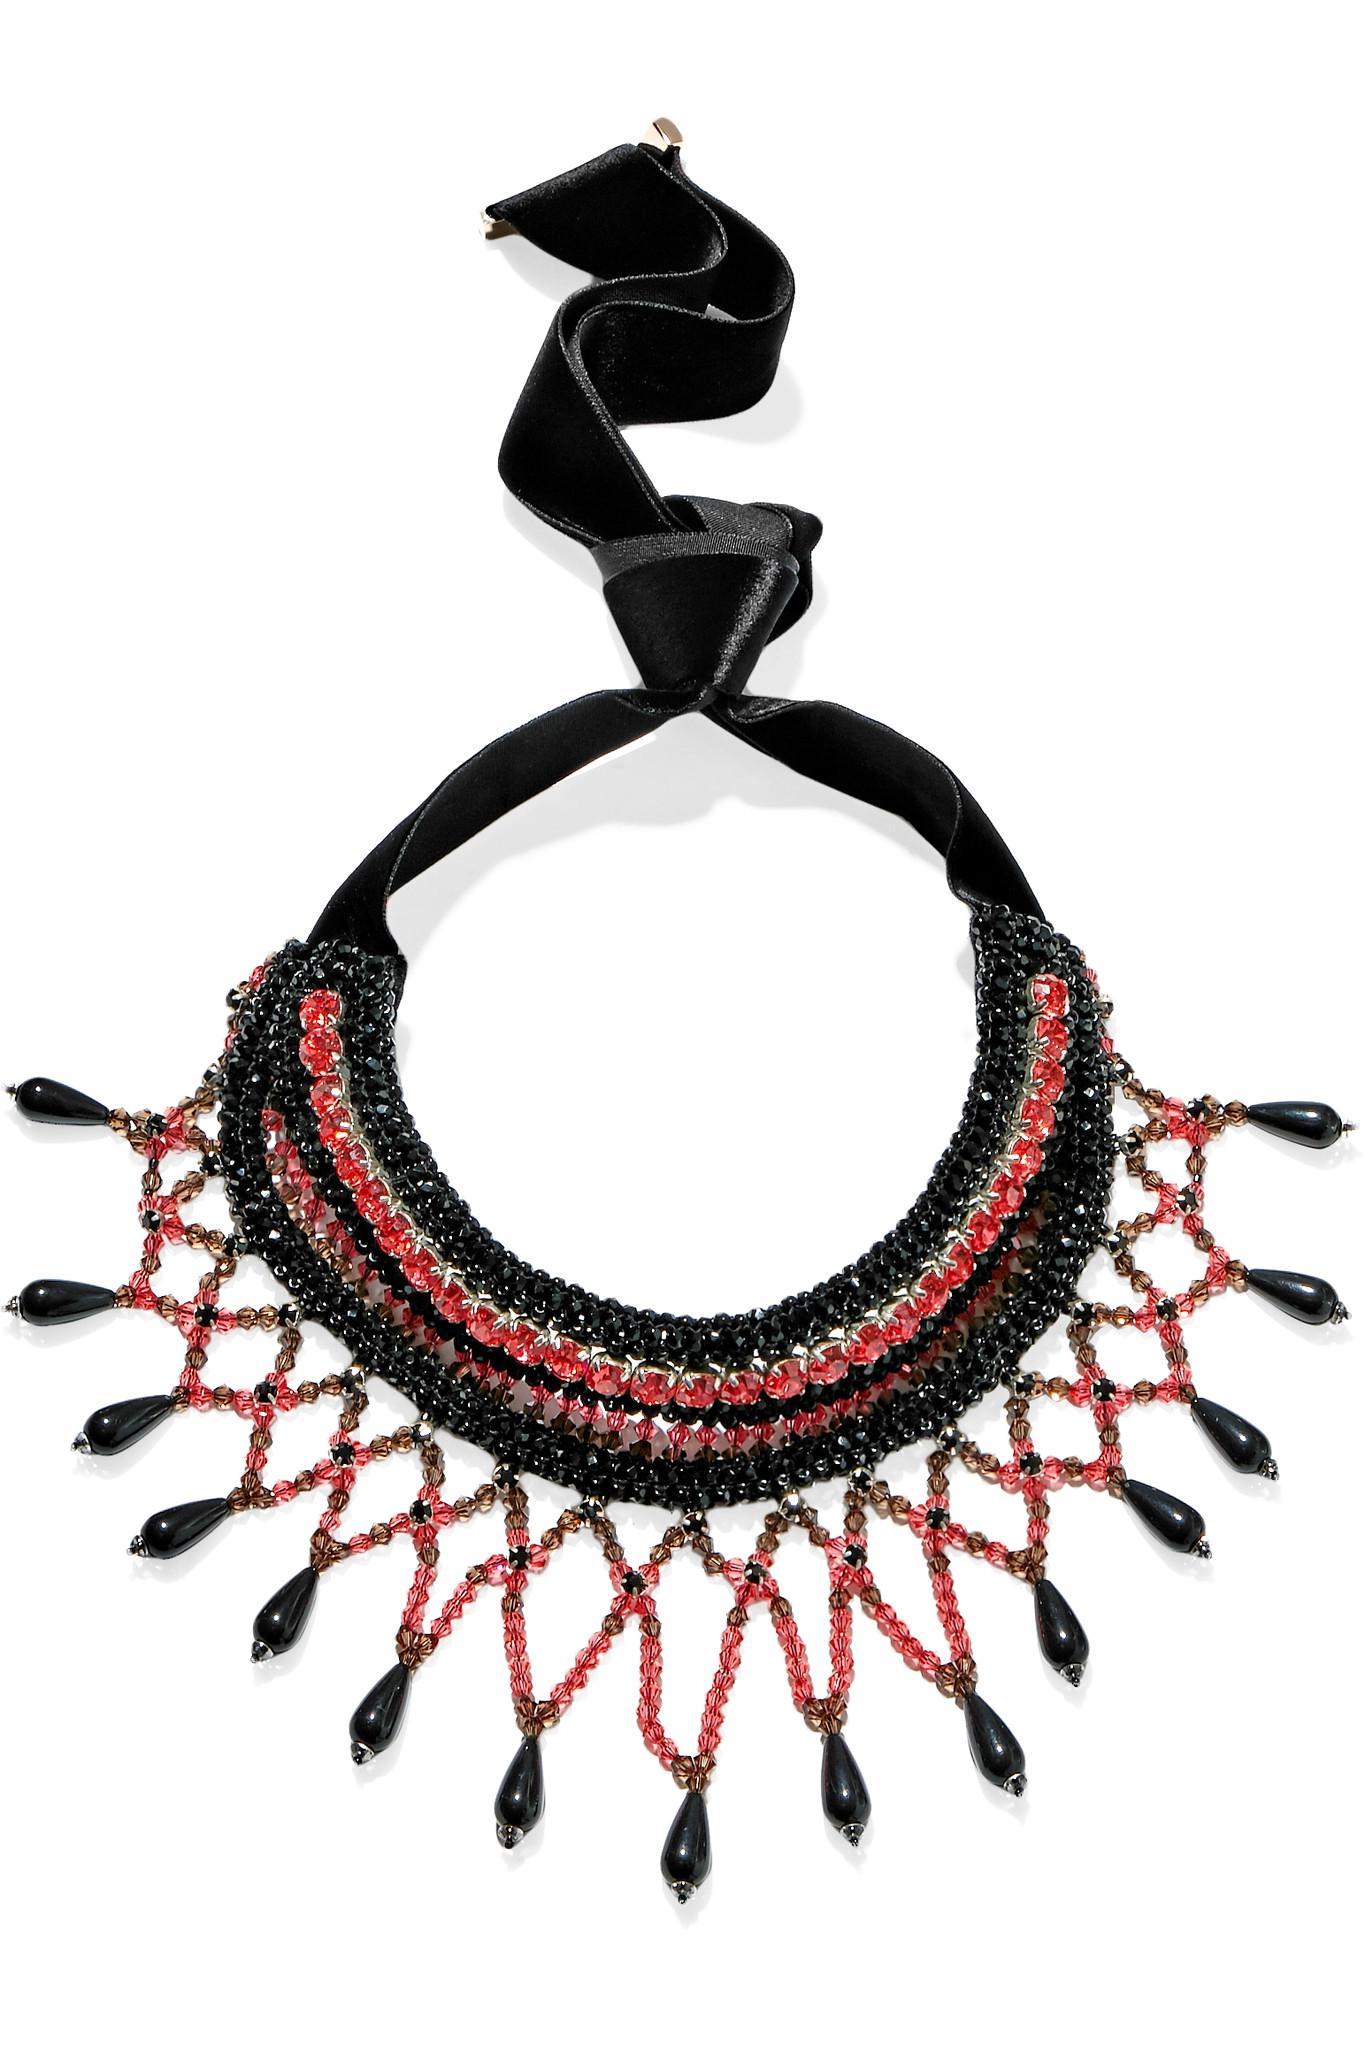 Cristal Y Collar De Cuentas - Etro Negro nwRcWHGXq